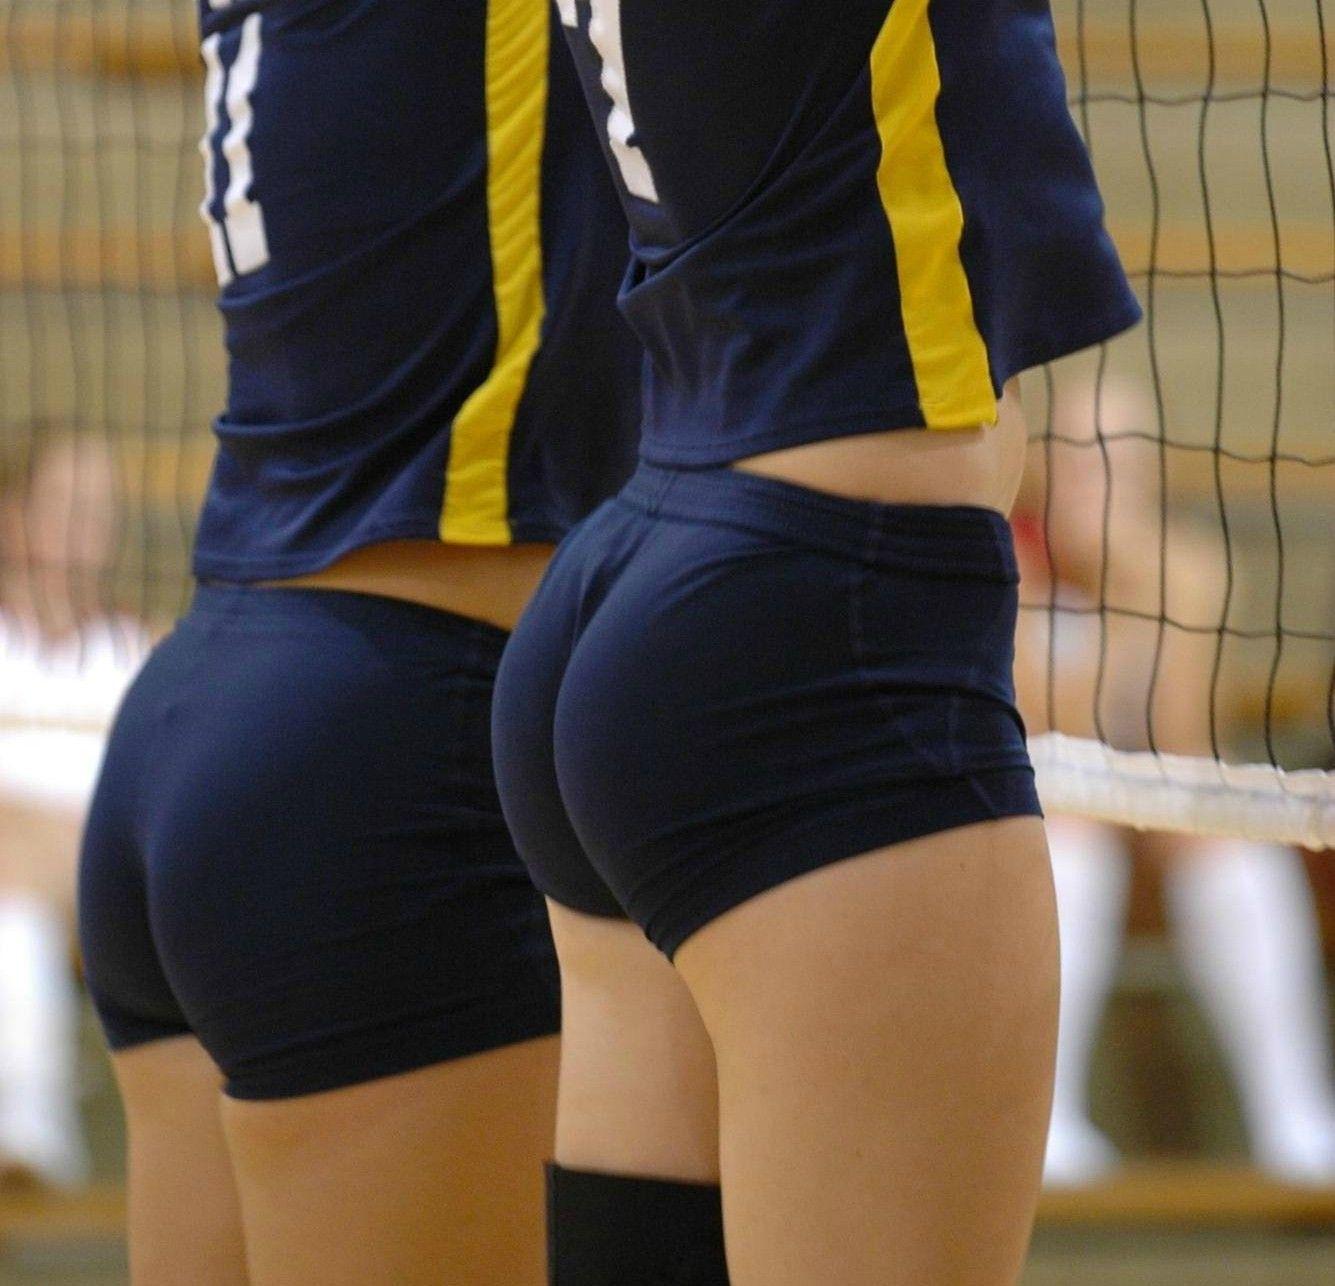 Busty women spandex shorts